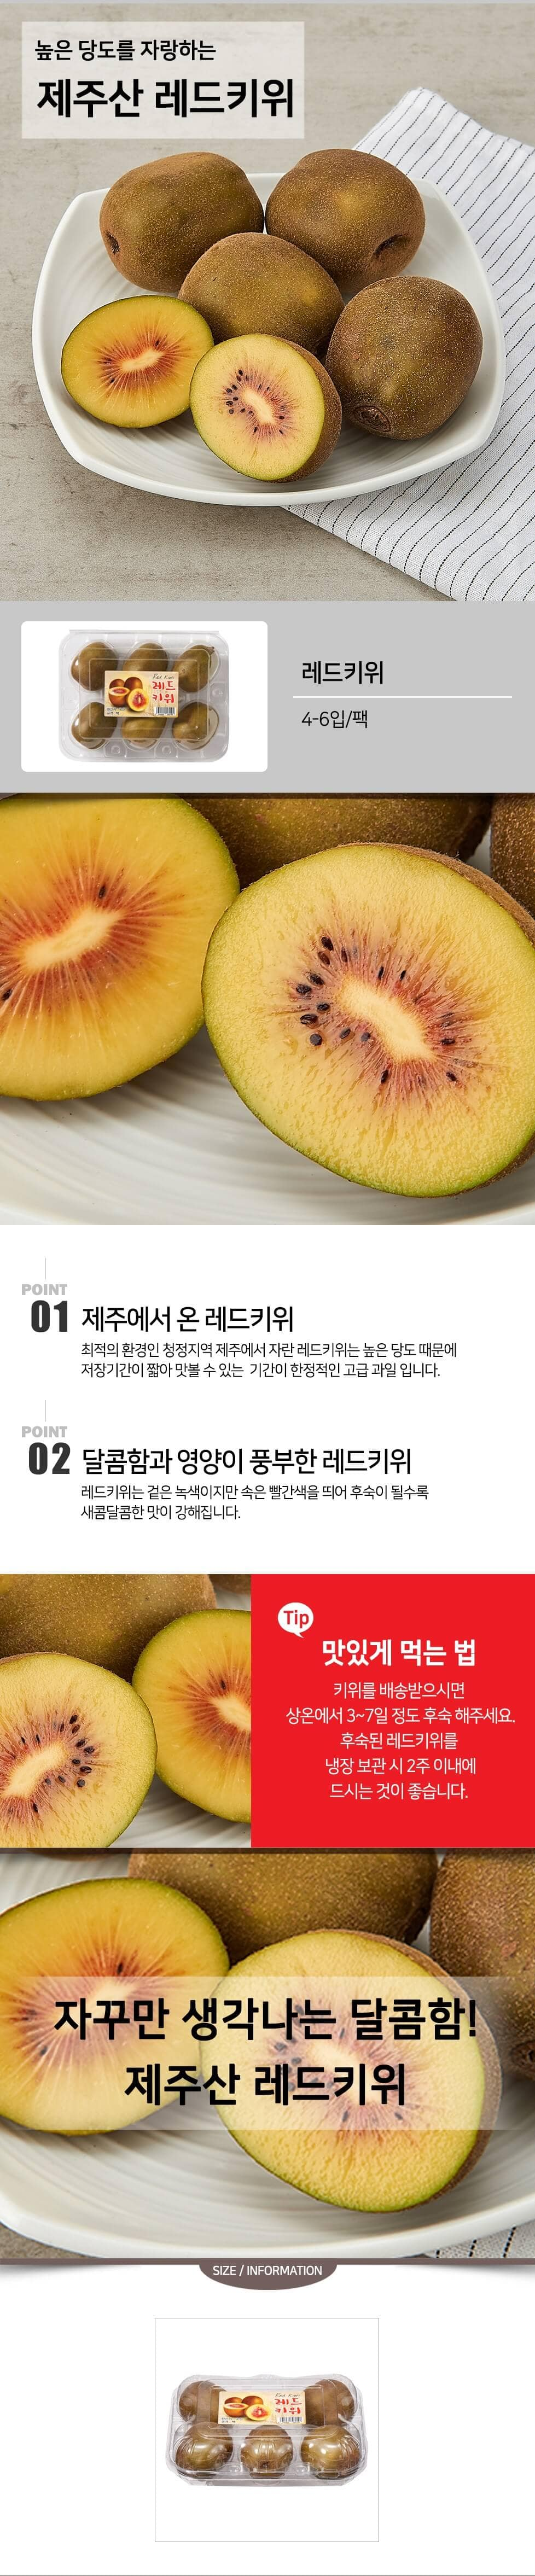 Kiwi ruot do Han Quoc - vinfruits.com 4 (1)